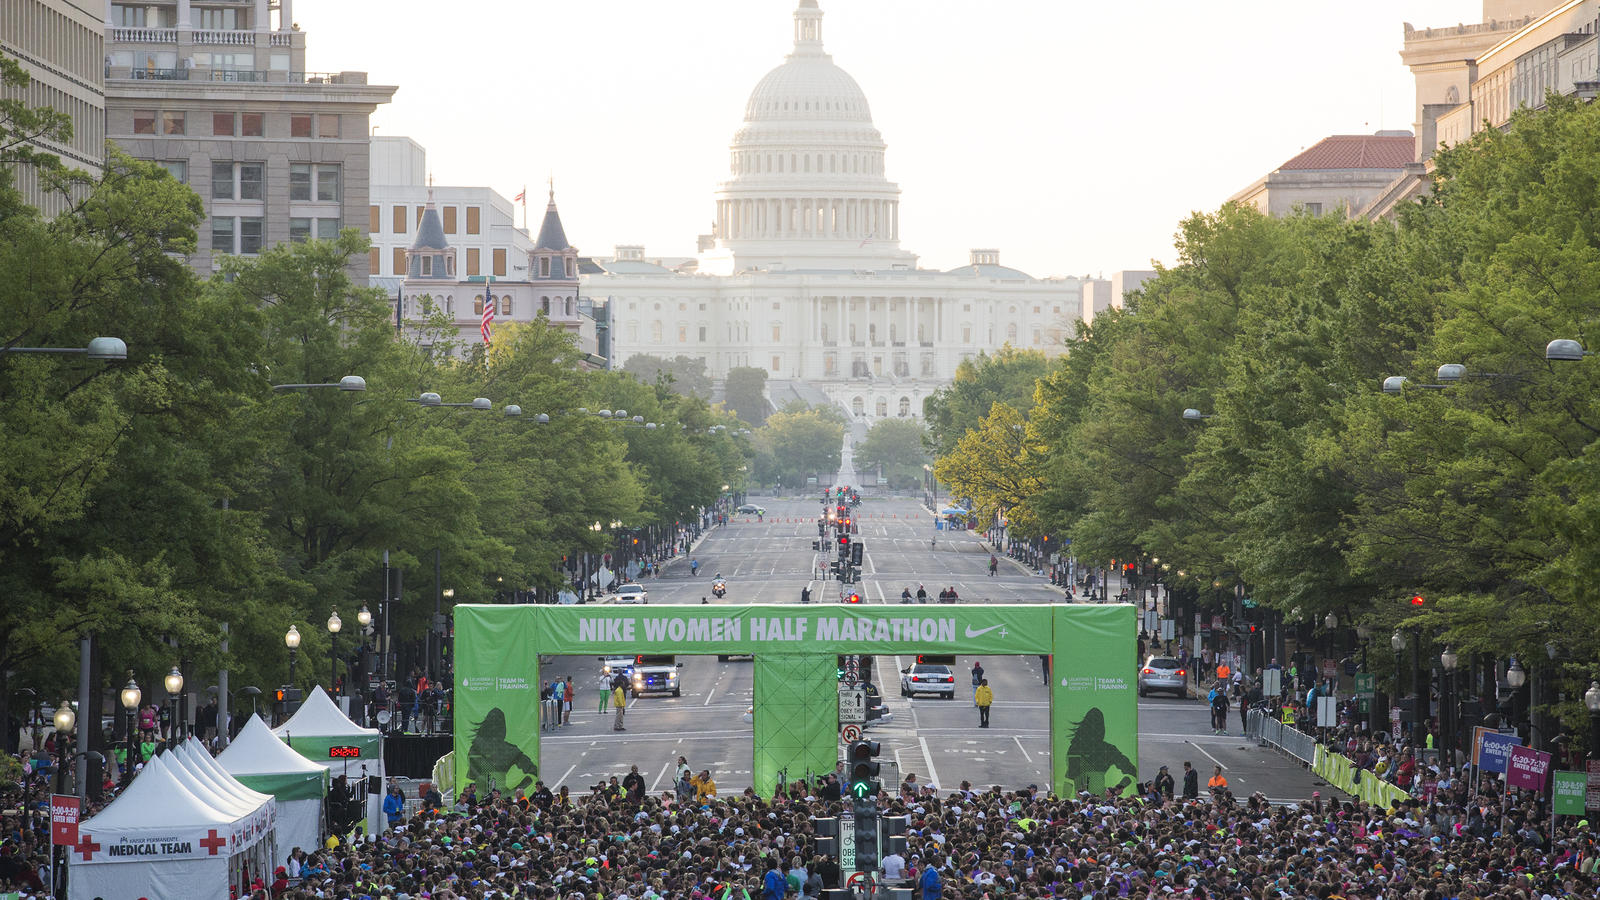 Nike Women Half Marathon DC Starting Line